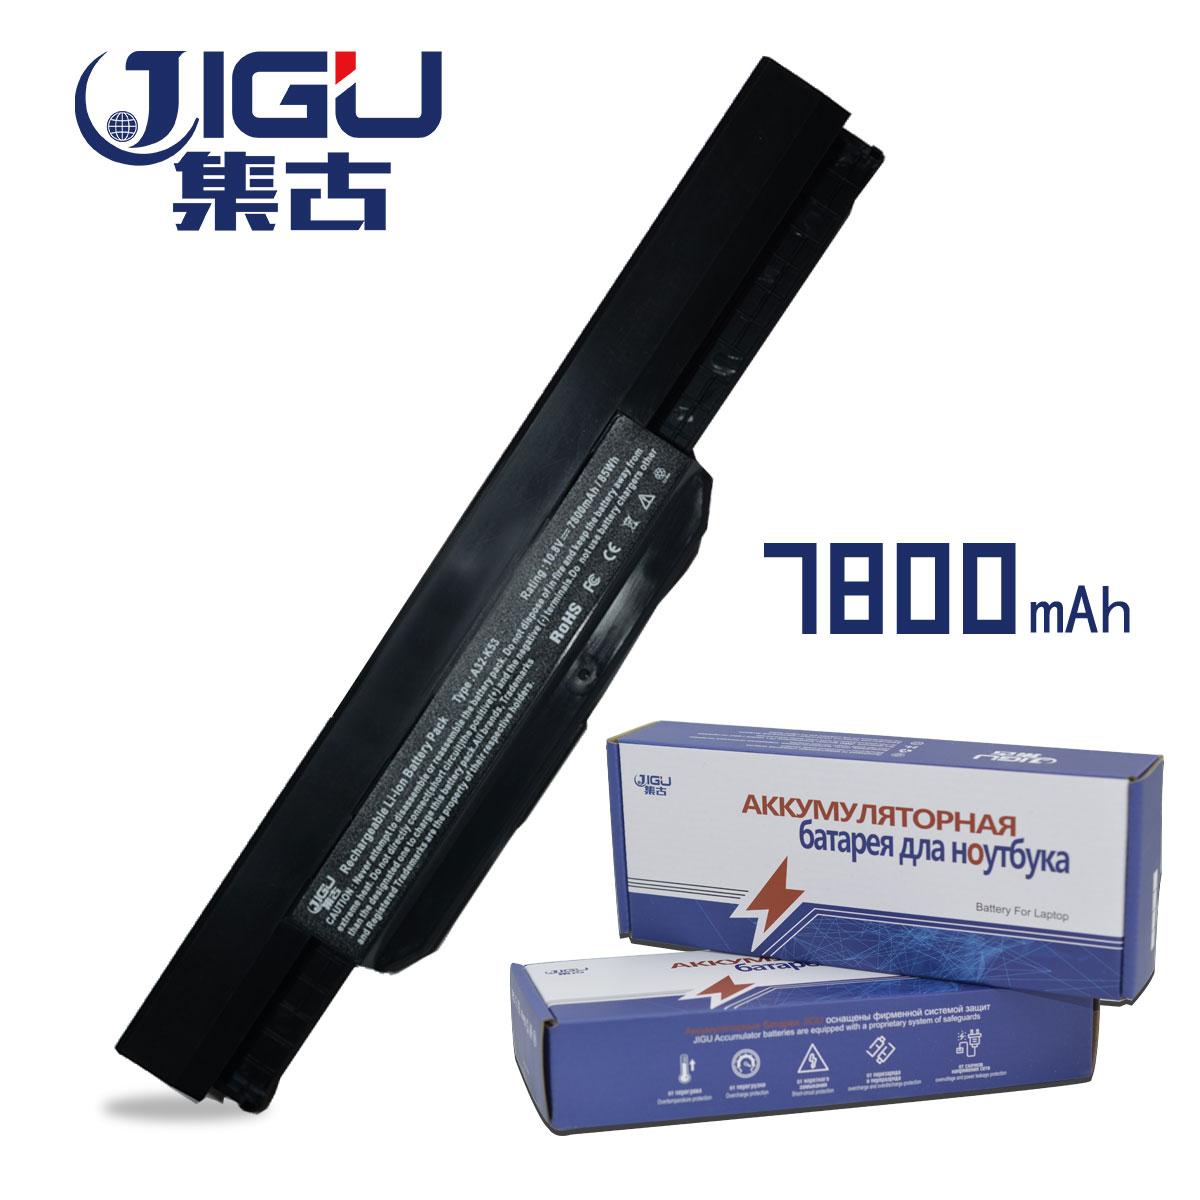 JIGU Replacement Laptop Battery For ASUS K53 K53B K53BR K53BY K53E K53S K53SC K53T K53TA K53TK K53U K53Z 9Cell